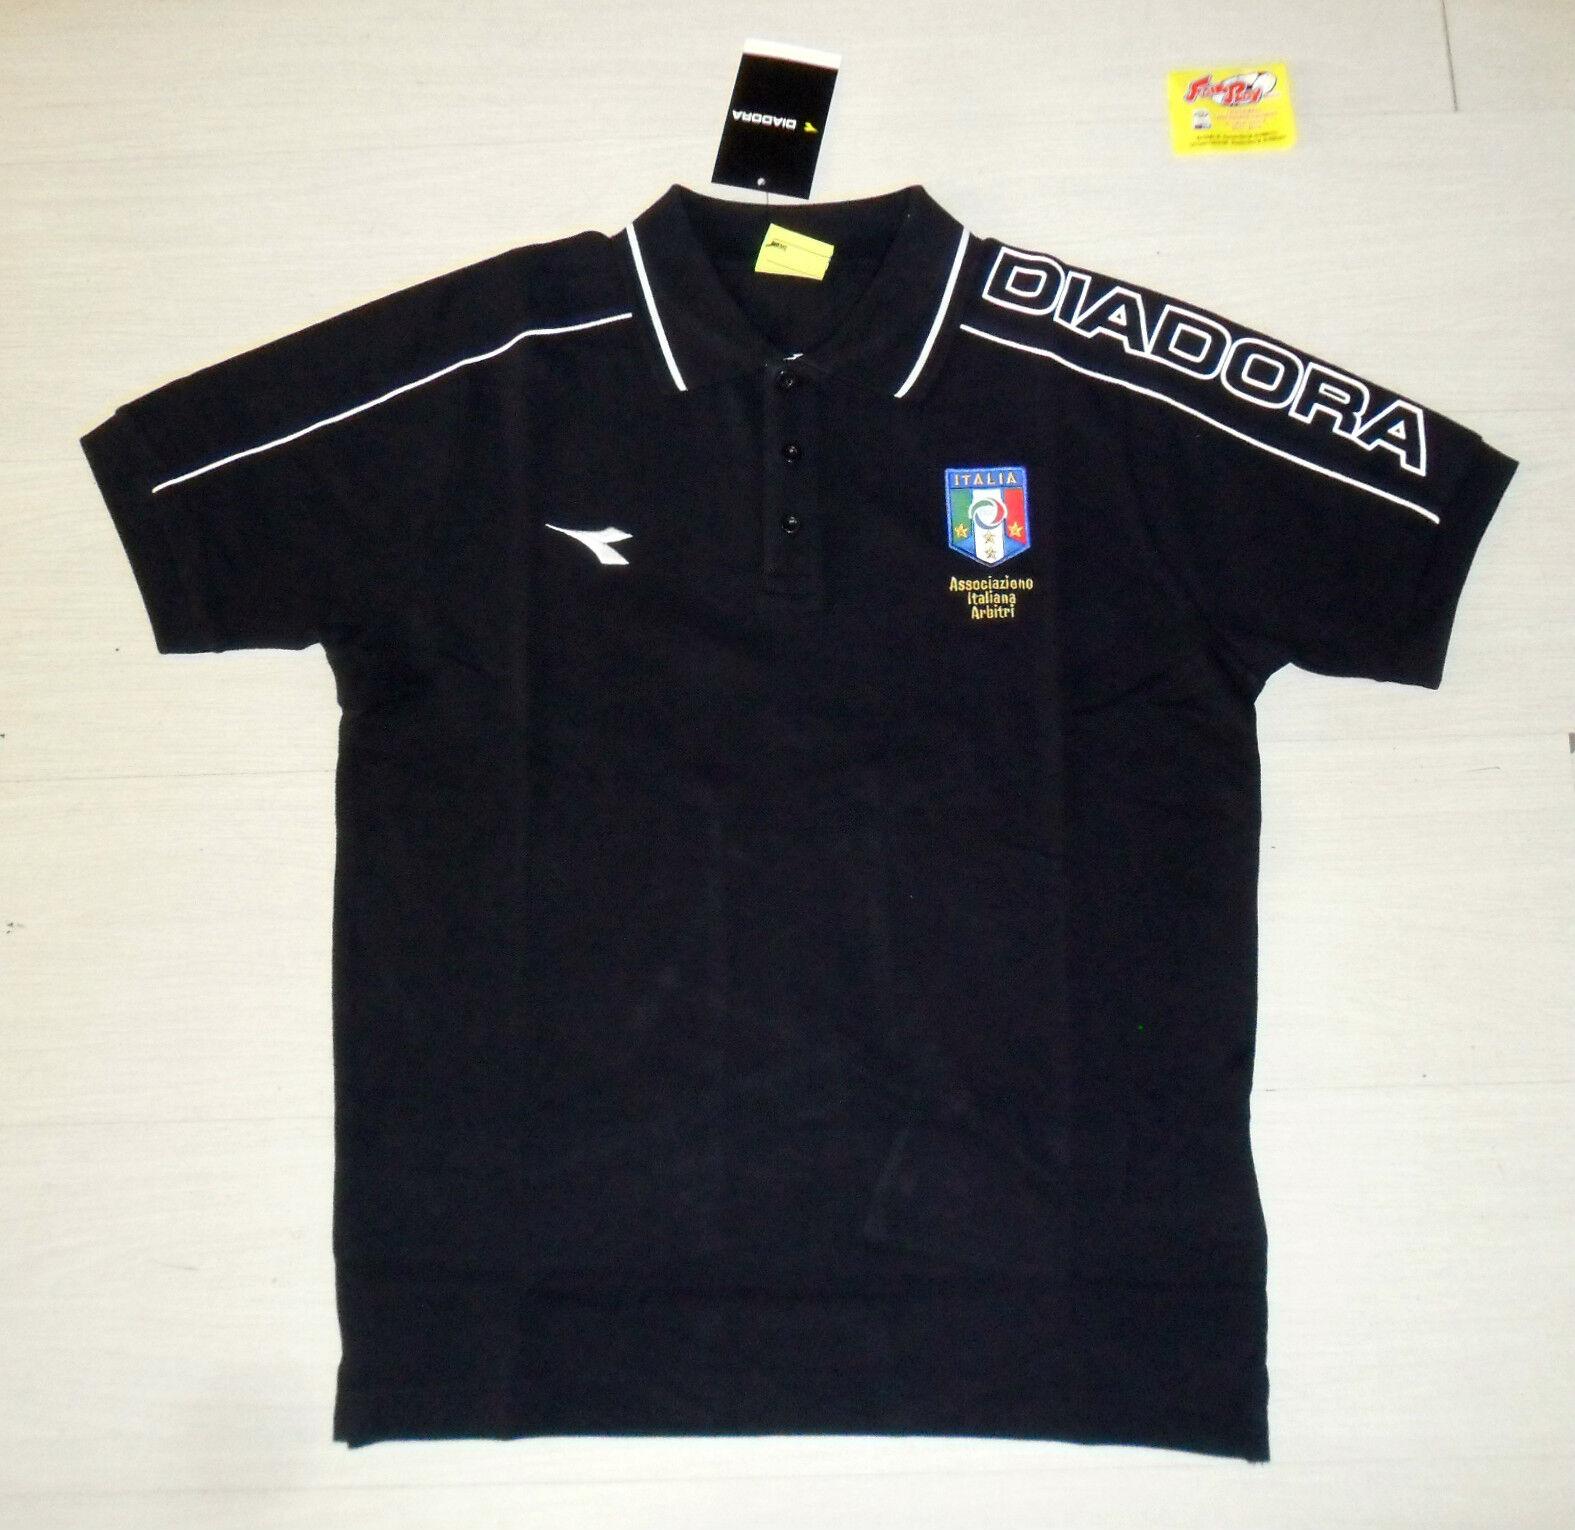 10024 TG. XL POLO RAPPRESENTANZA  ARBITRO ARBITRO ARBITRO AIA ITALY REFREE FREE TIME SHIRT a822ed